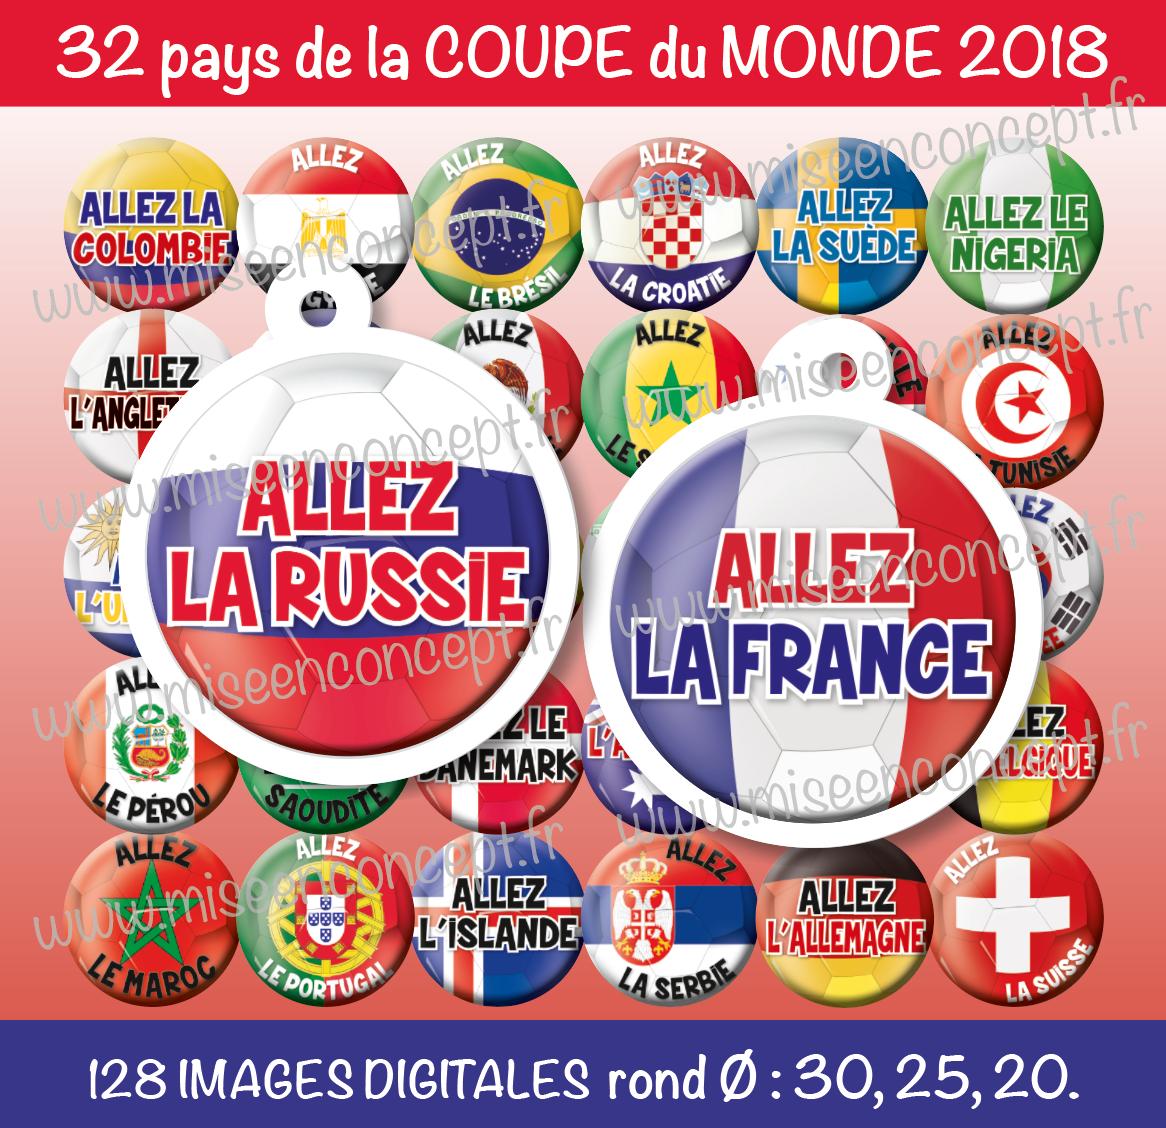 128 images digitales allez la coupe du monde 2018 rond images cabochons football foot. Black Bedroom Furniture Sets. Home Design Ideas